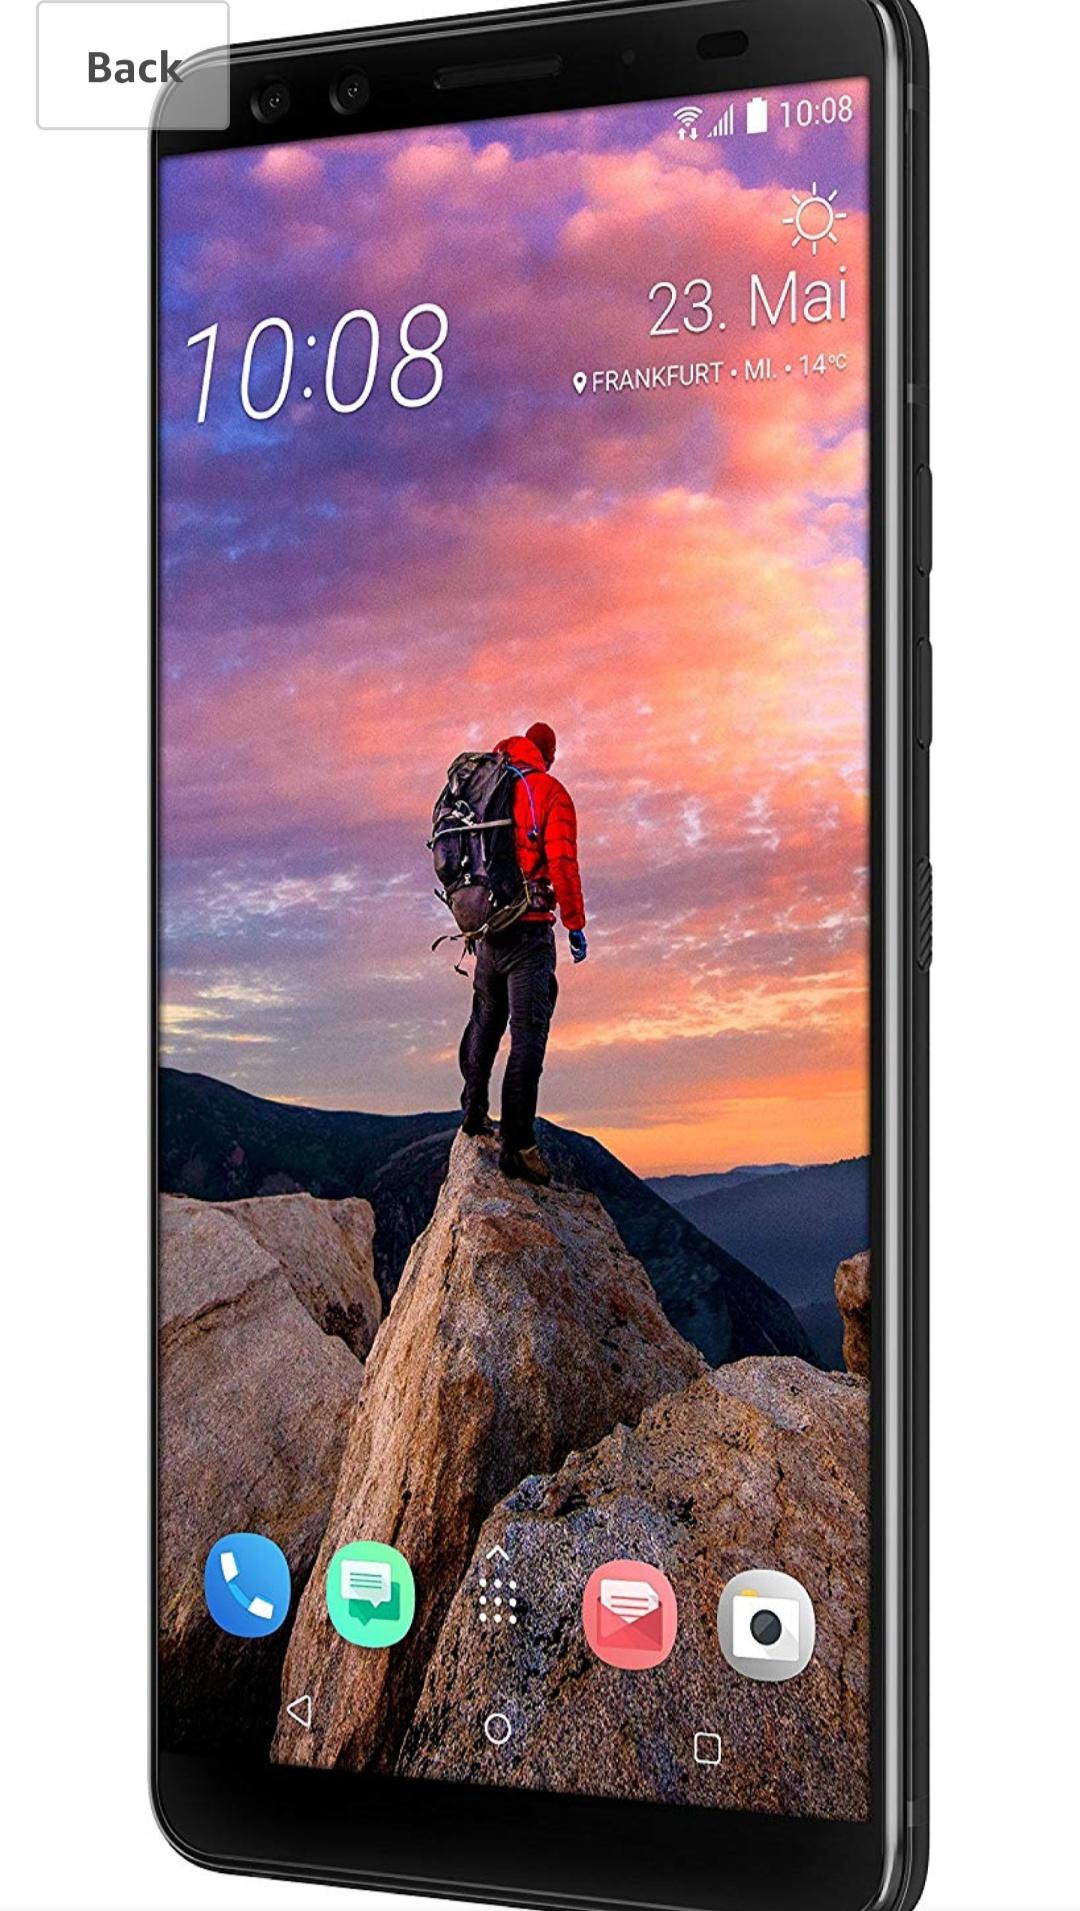 Htc U12 + Smartphone 64GB Translucent Blue £412 (£399.99 Fee Free) @ Amazon Germany